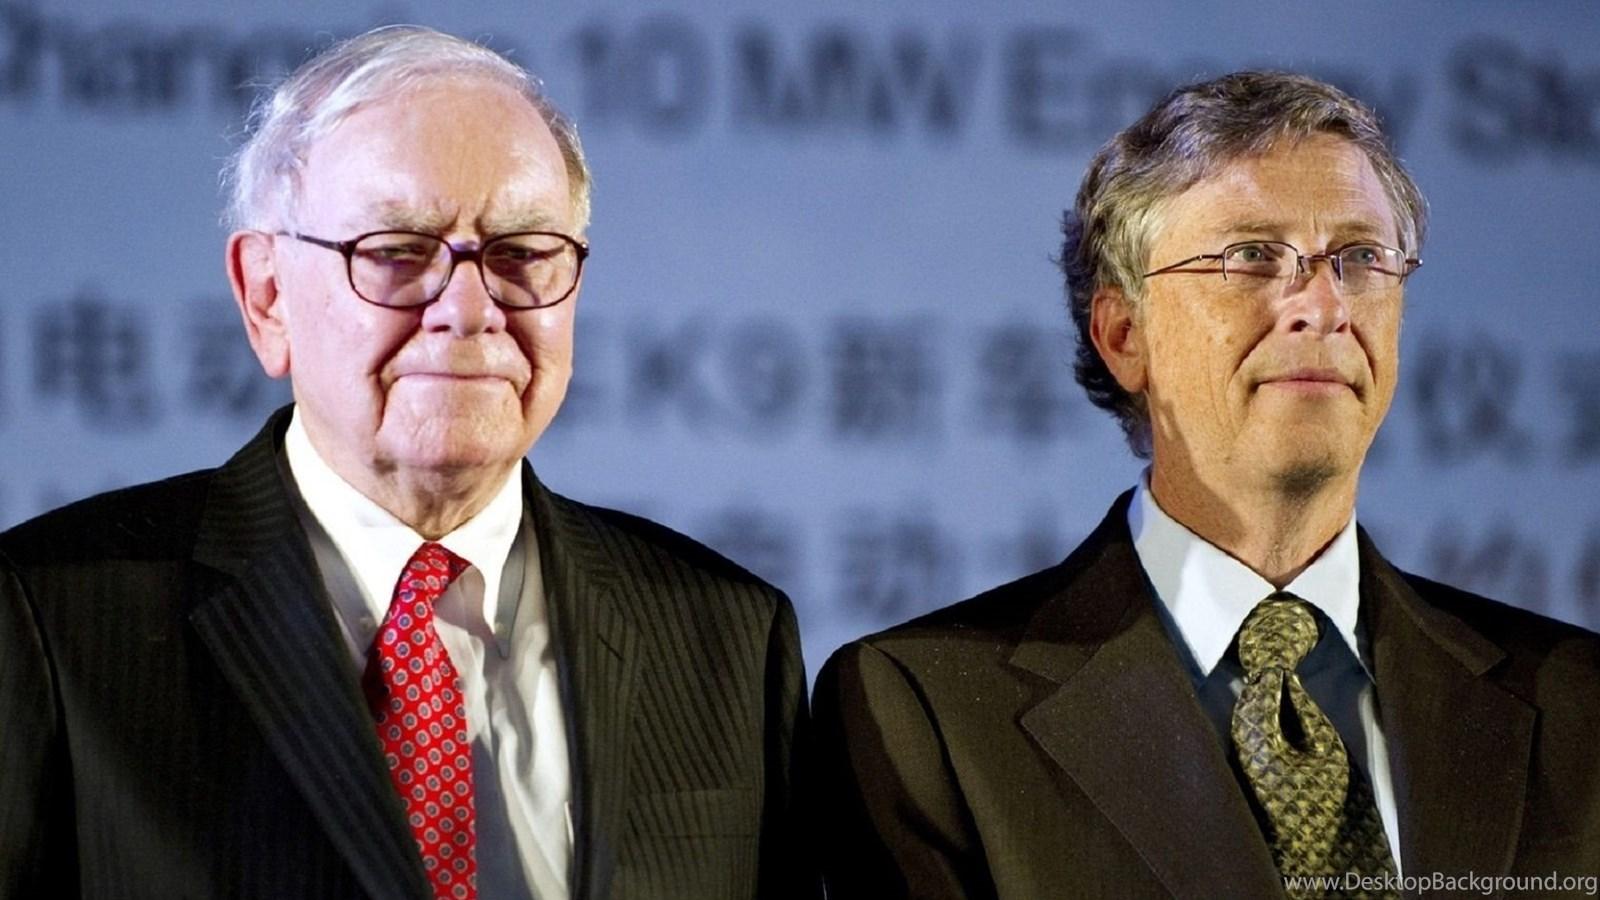 1680x1050 billionaire, bill gates, warren buffett, bill gates and